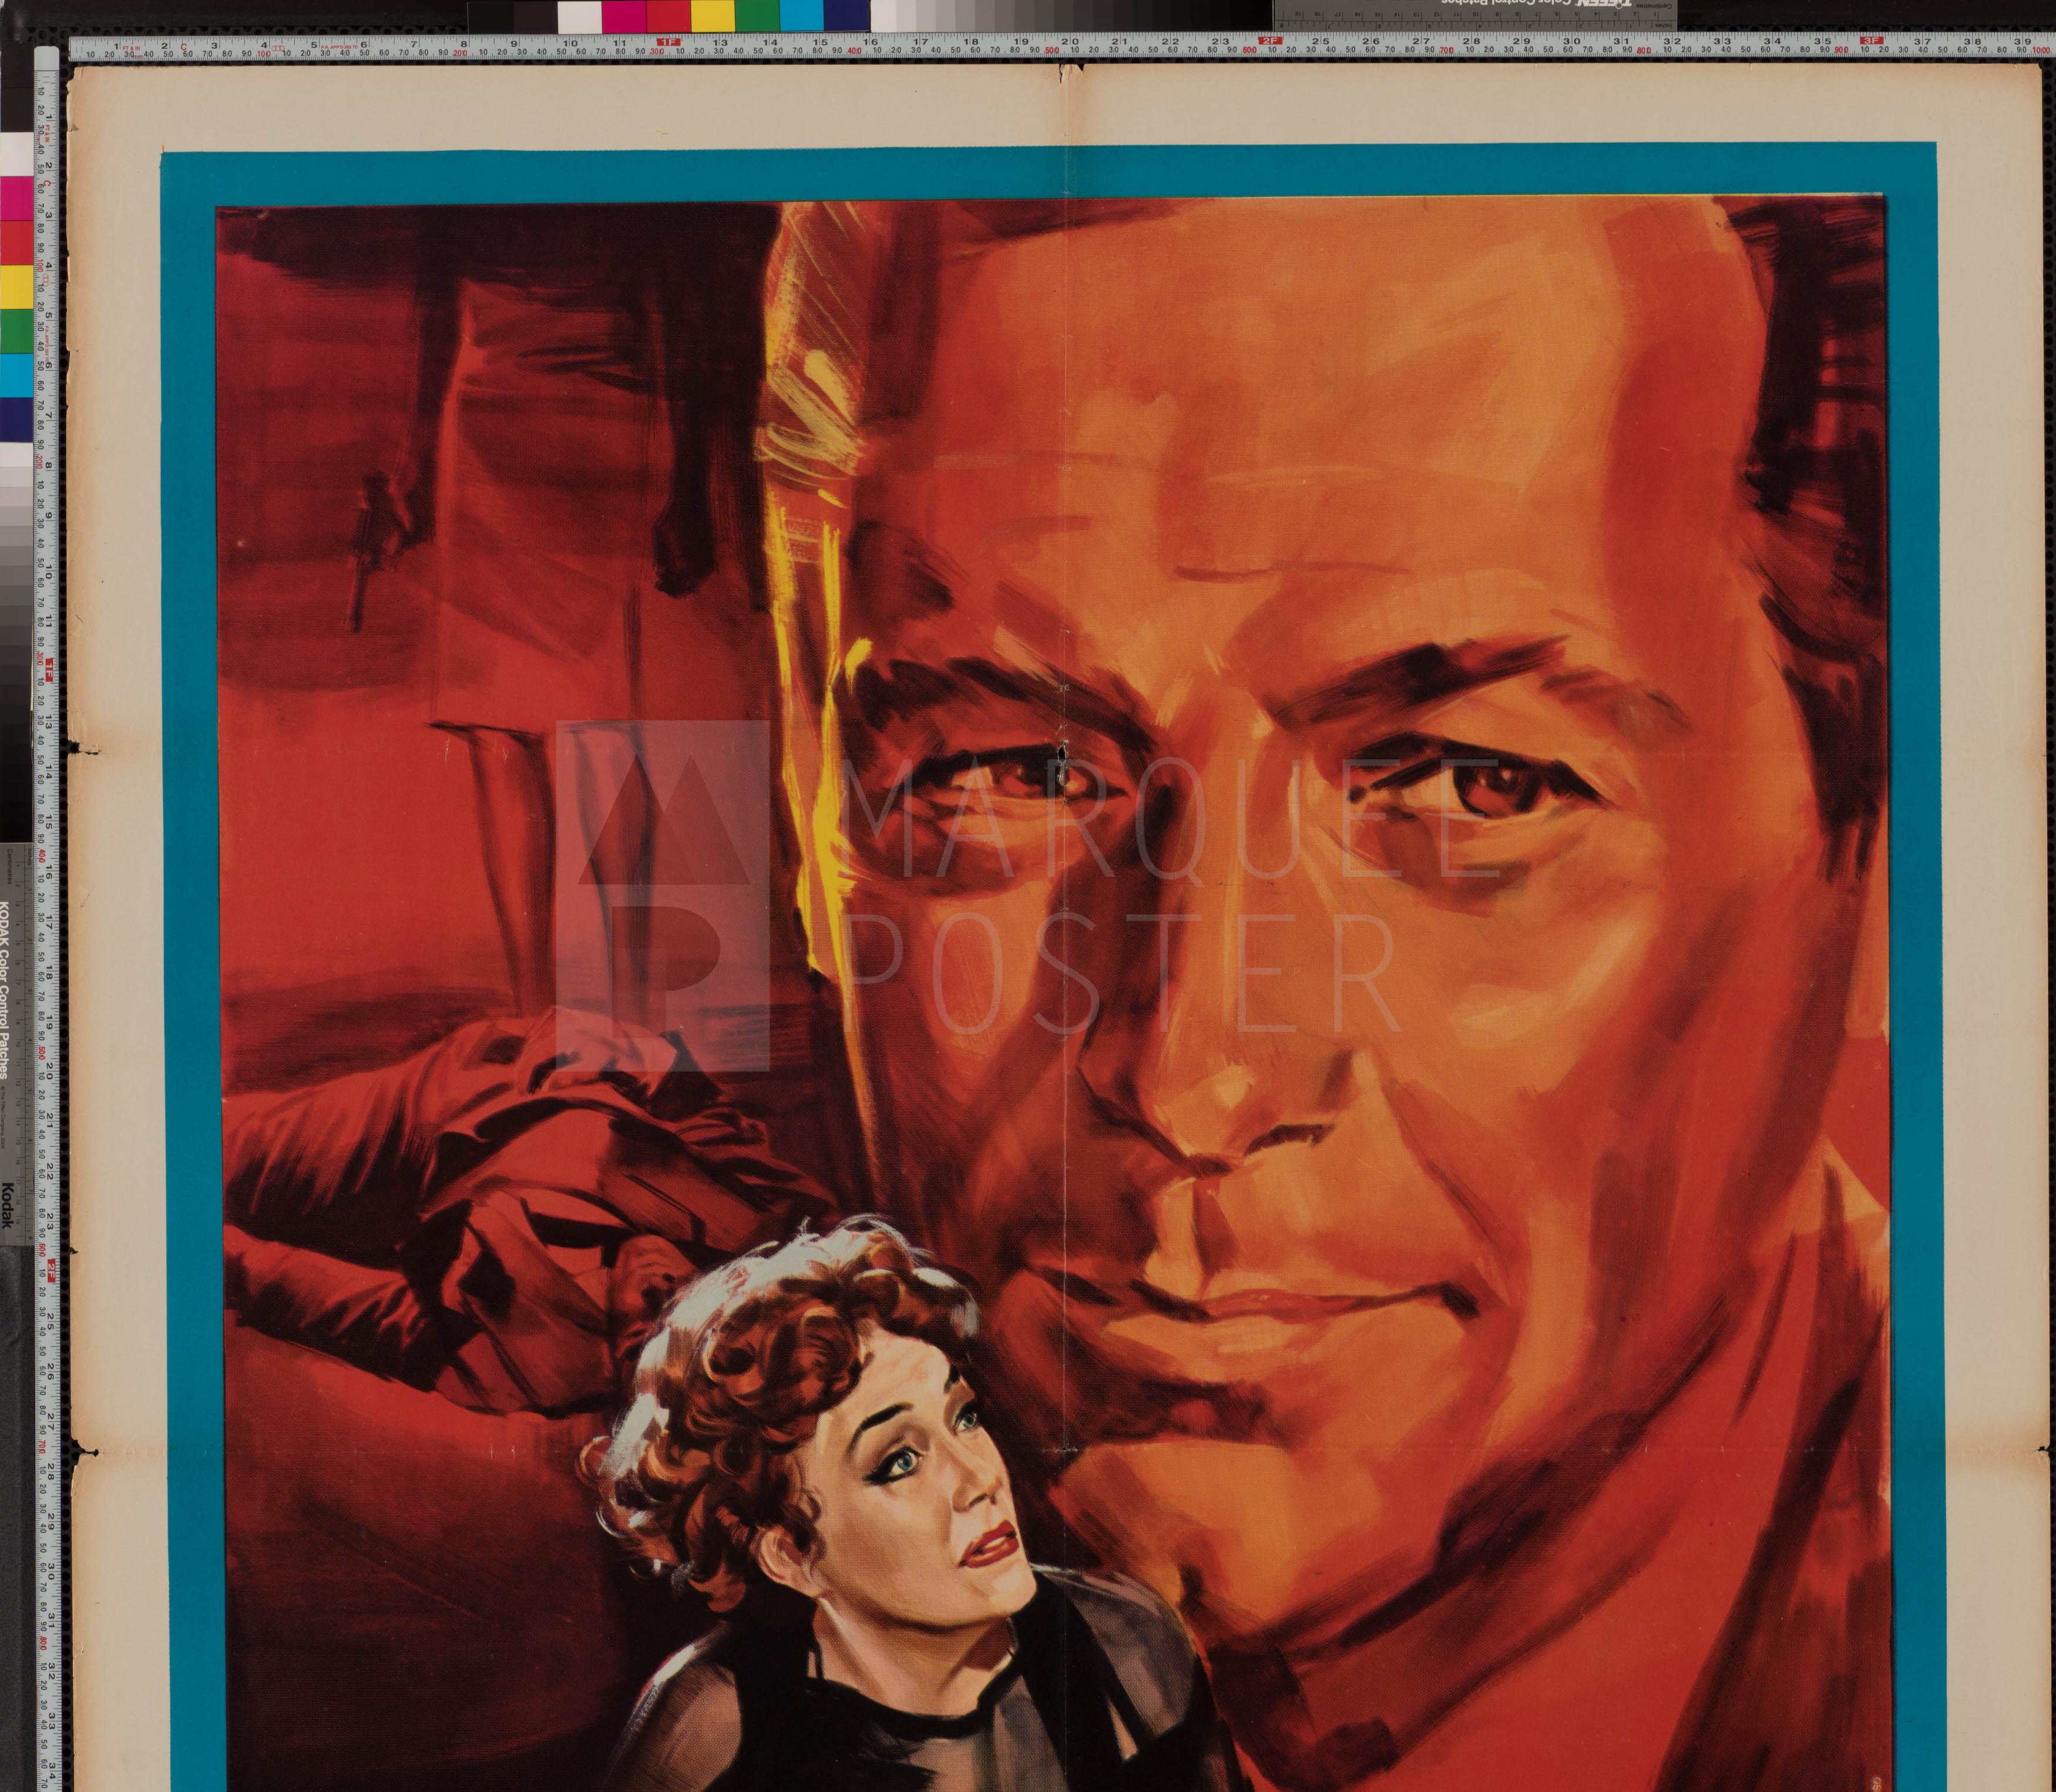 23-sunset-blvd-re-release-italian-2-foglio-1966-02